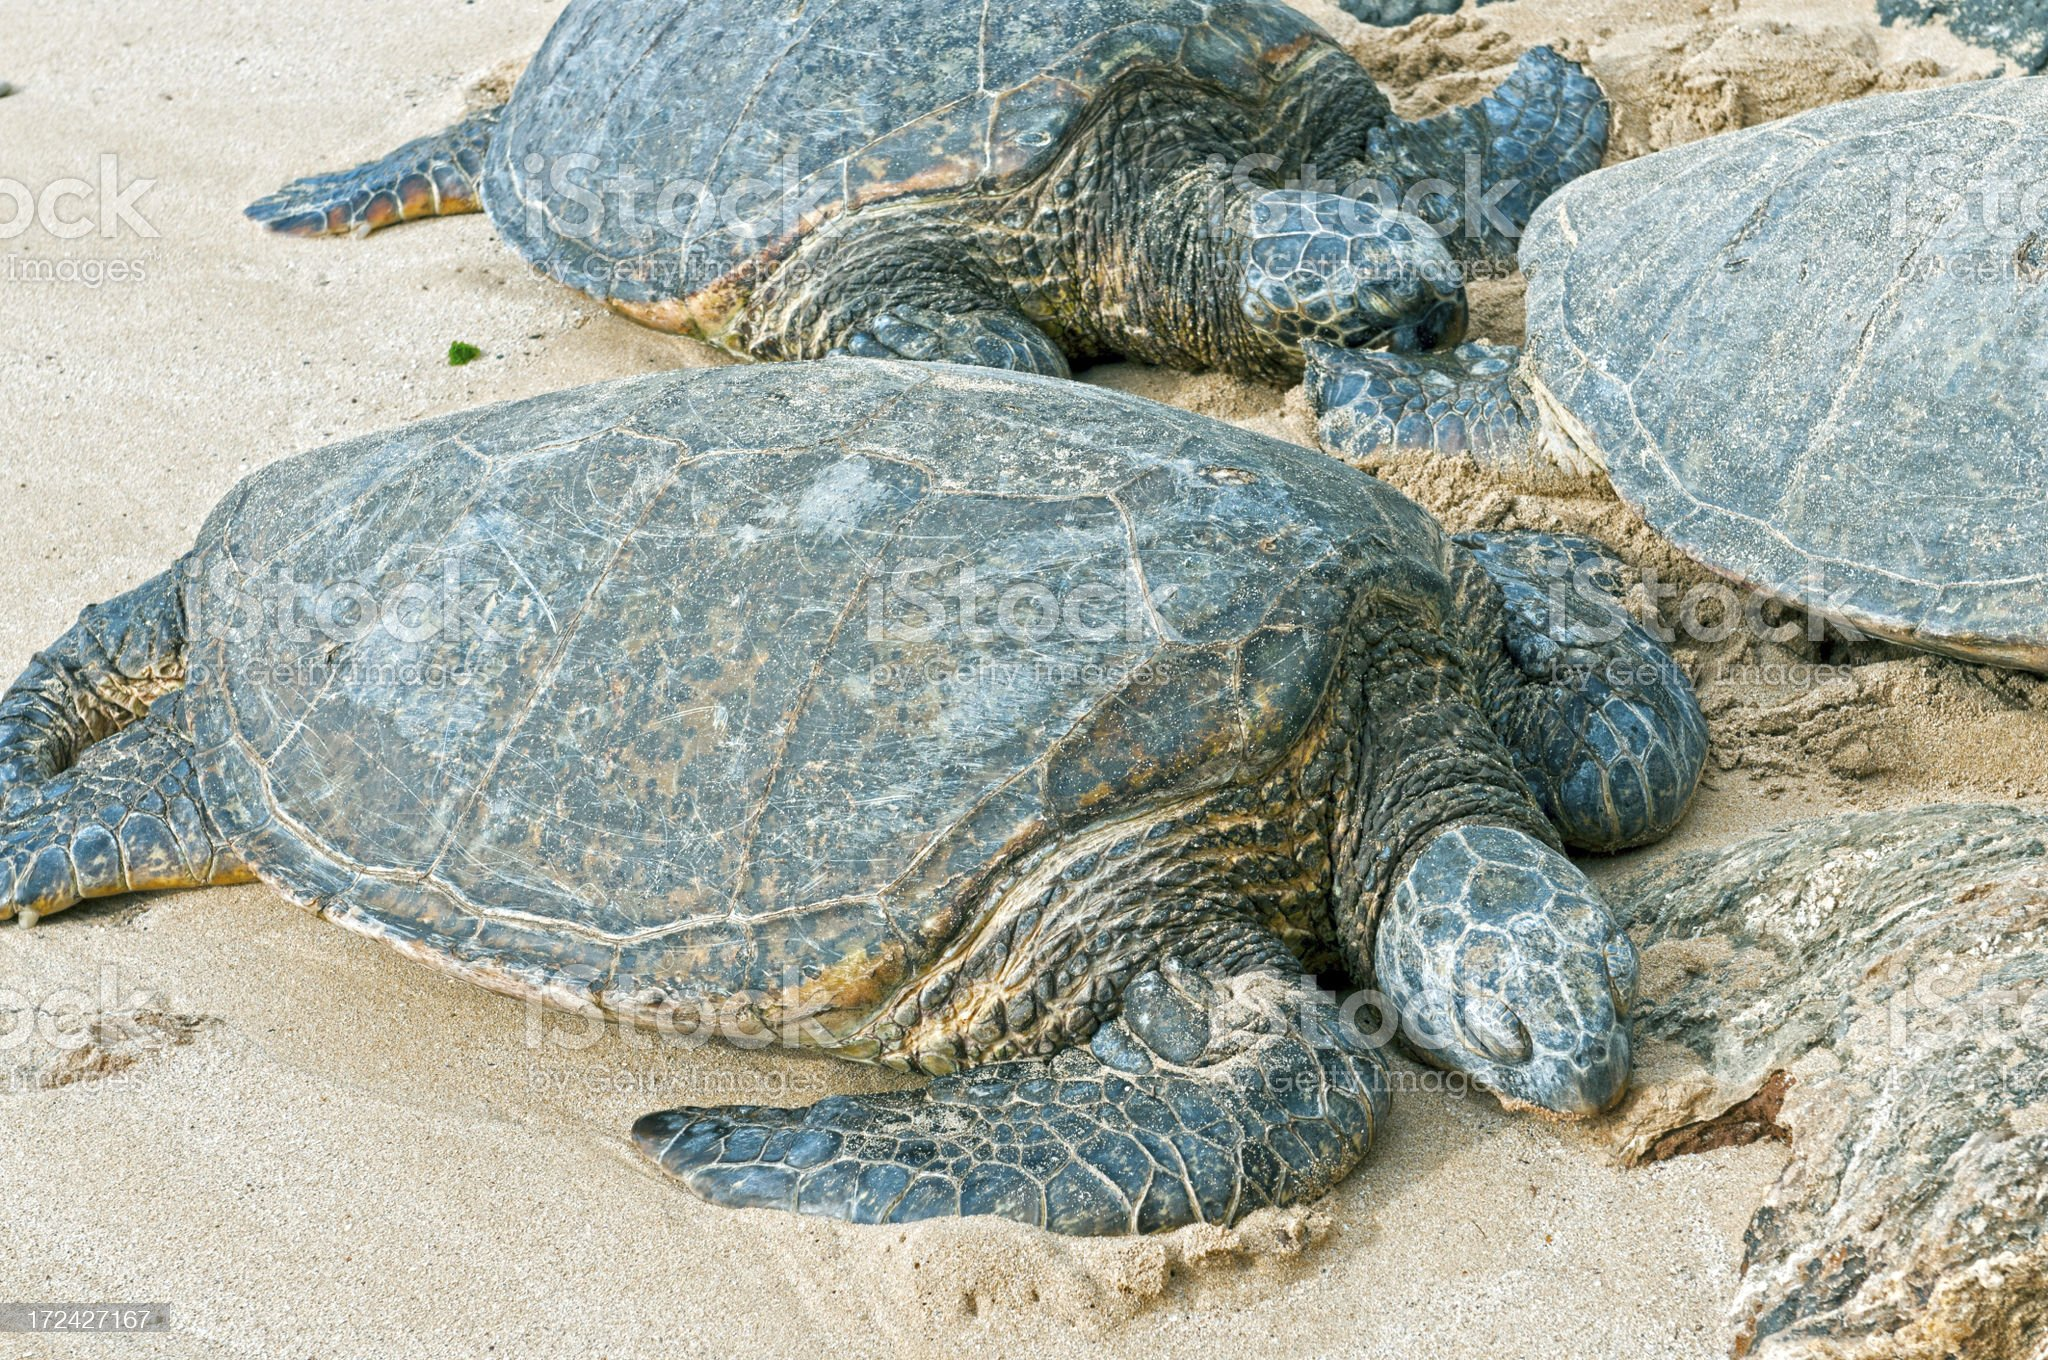 Green sea turtles resting on sandy beach in Hawaii royalty-free stock photo